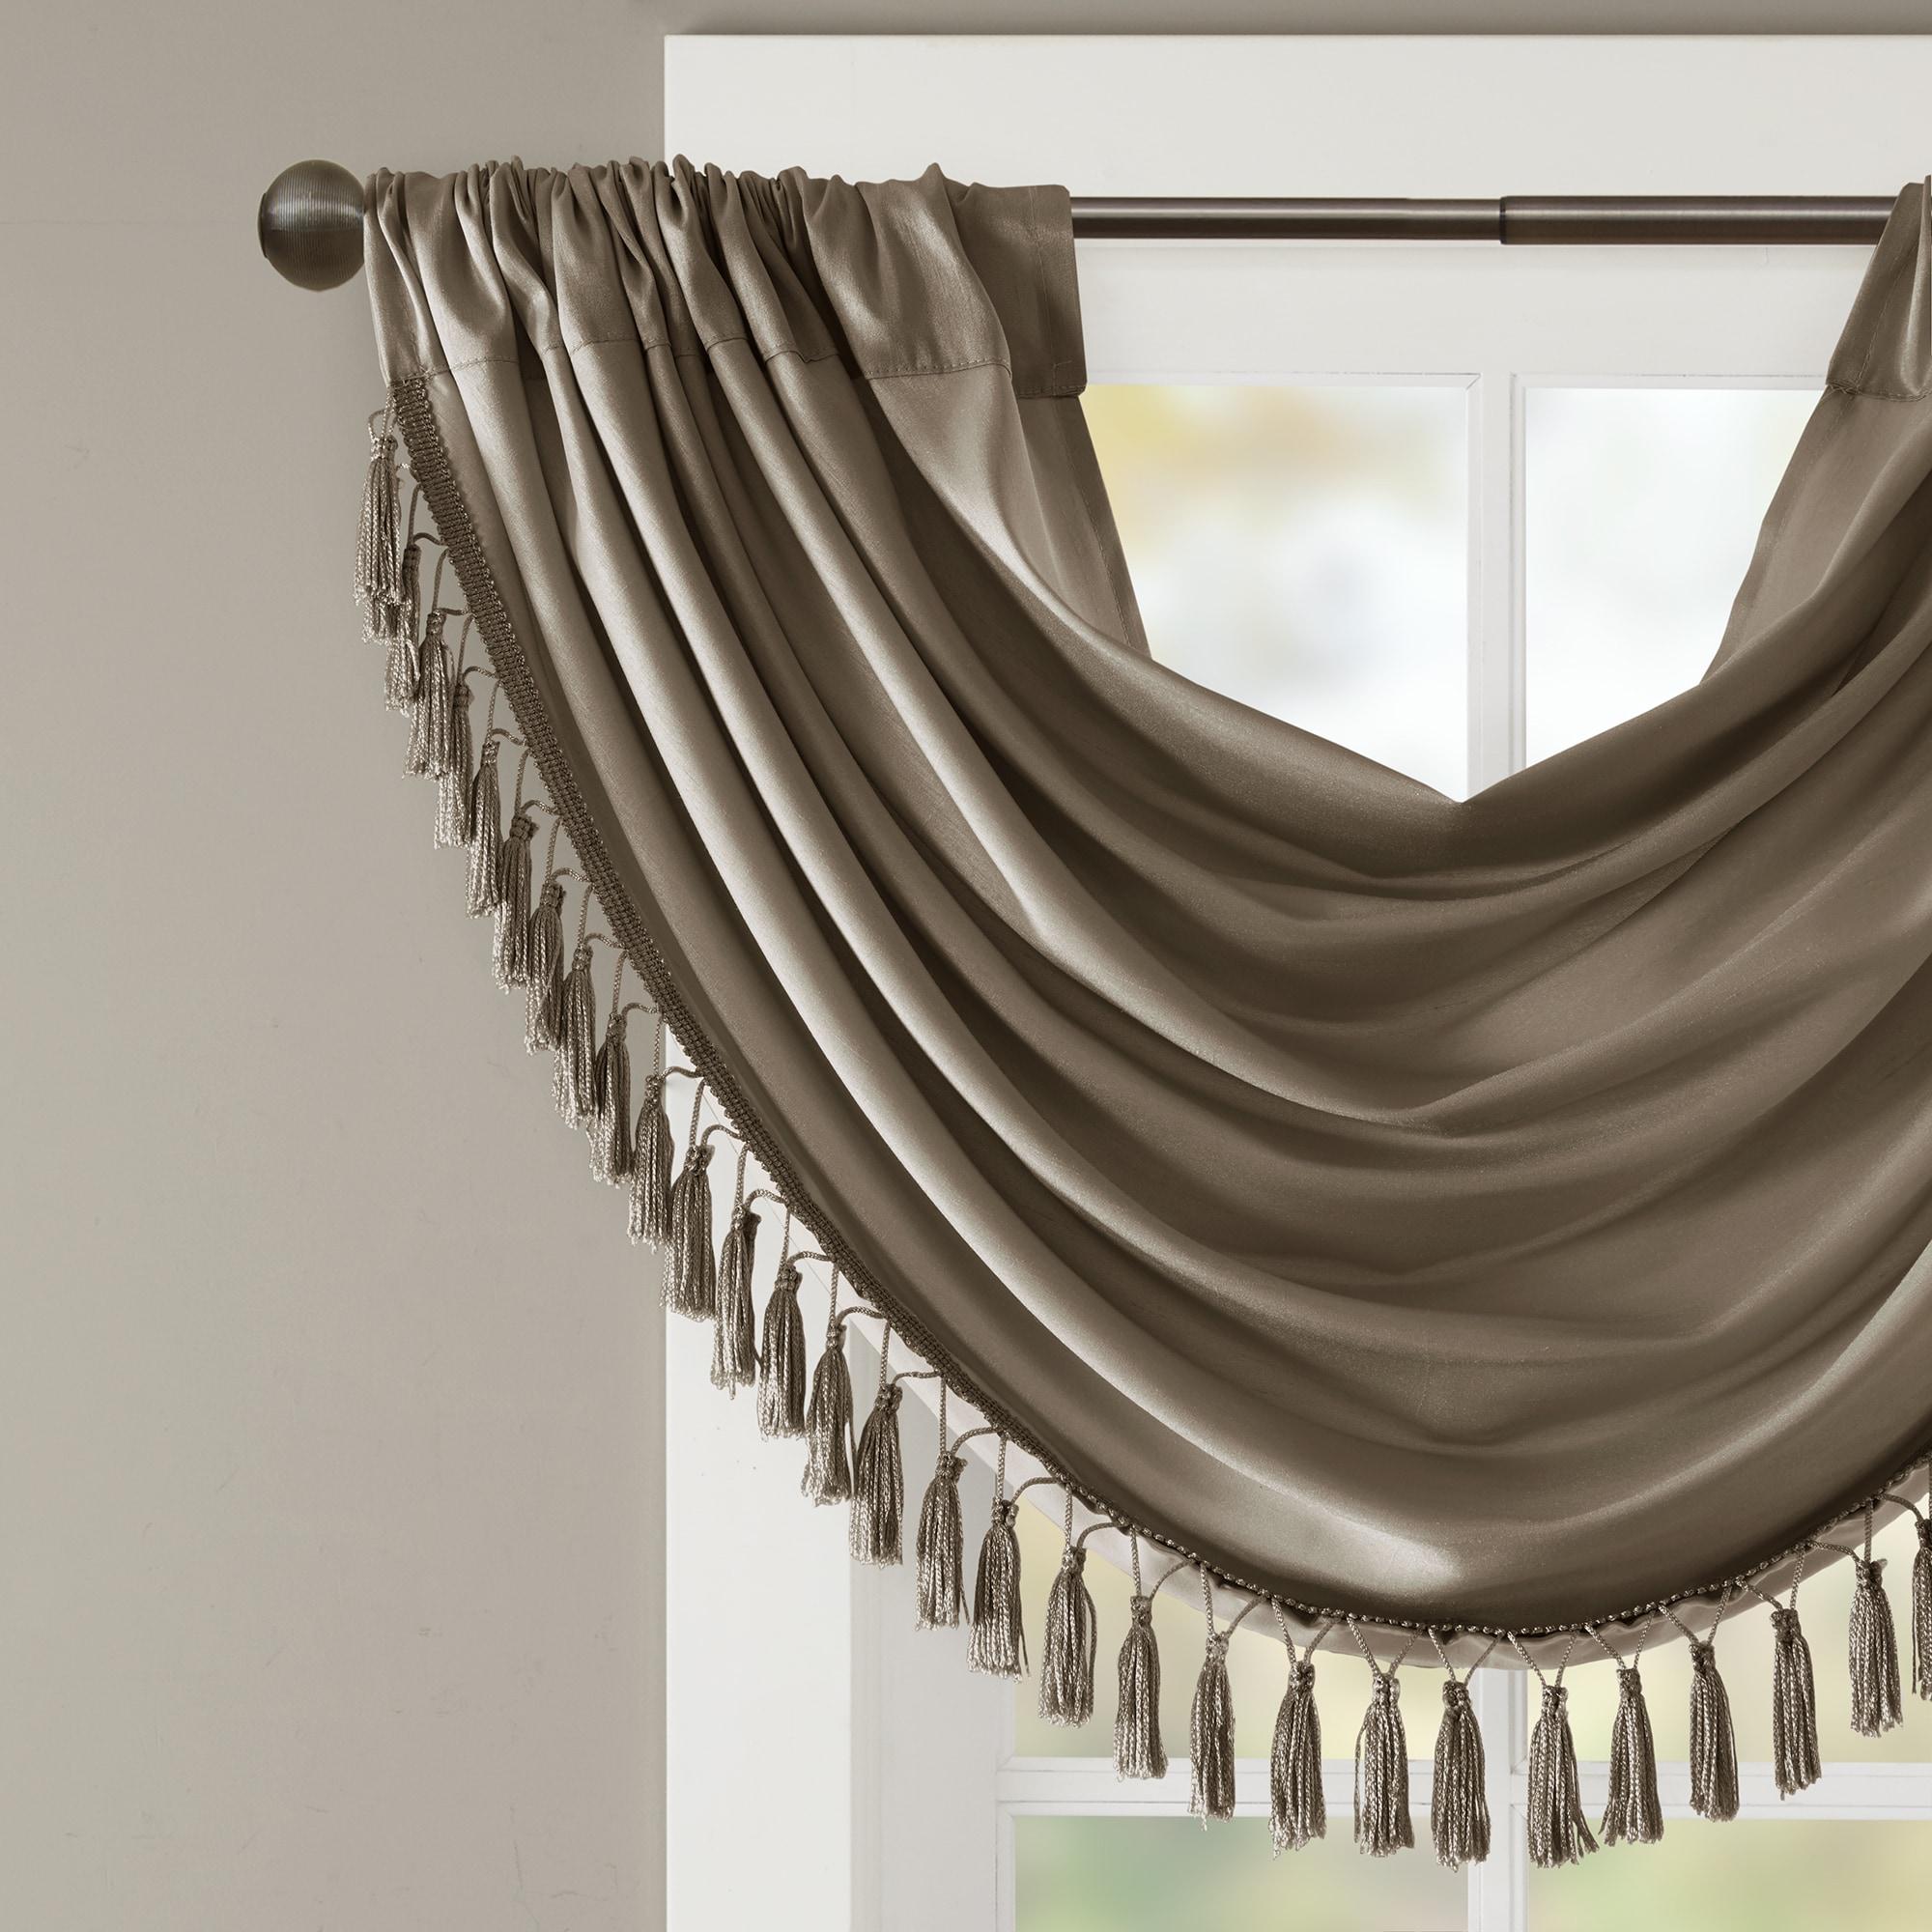 treatments reviews laurel springs valance waverly curtain lined valances window pdx wayfair